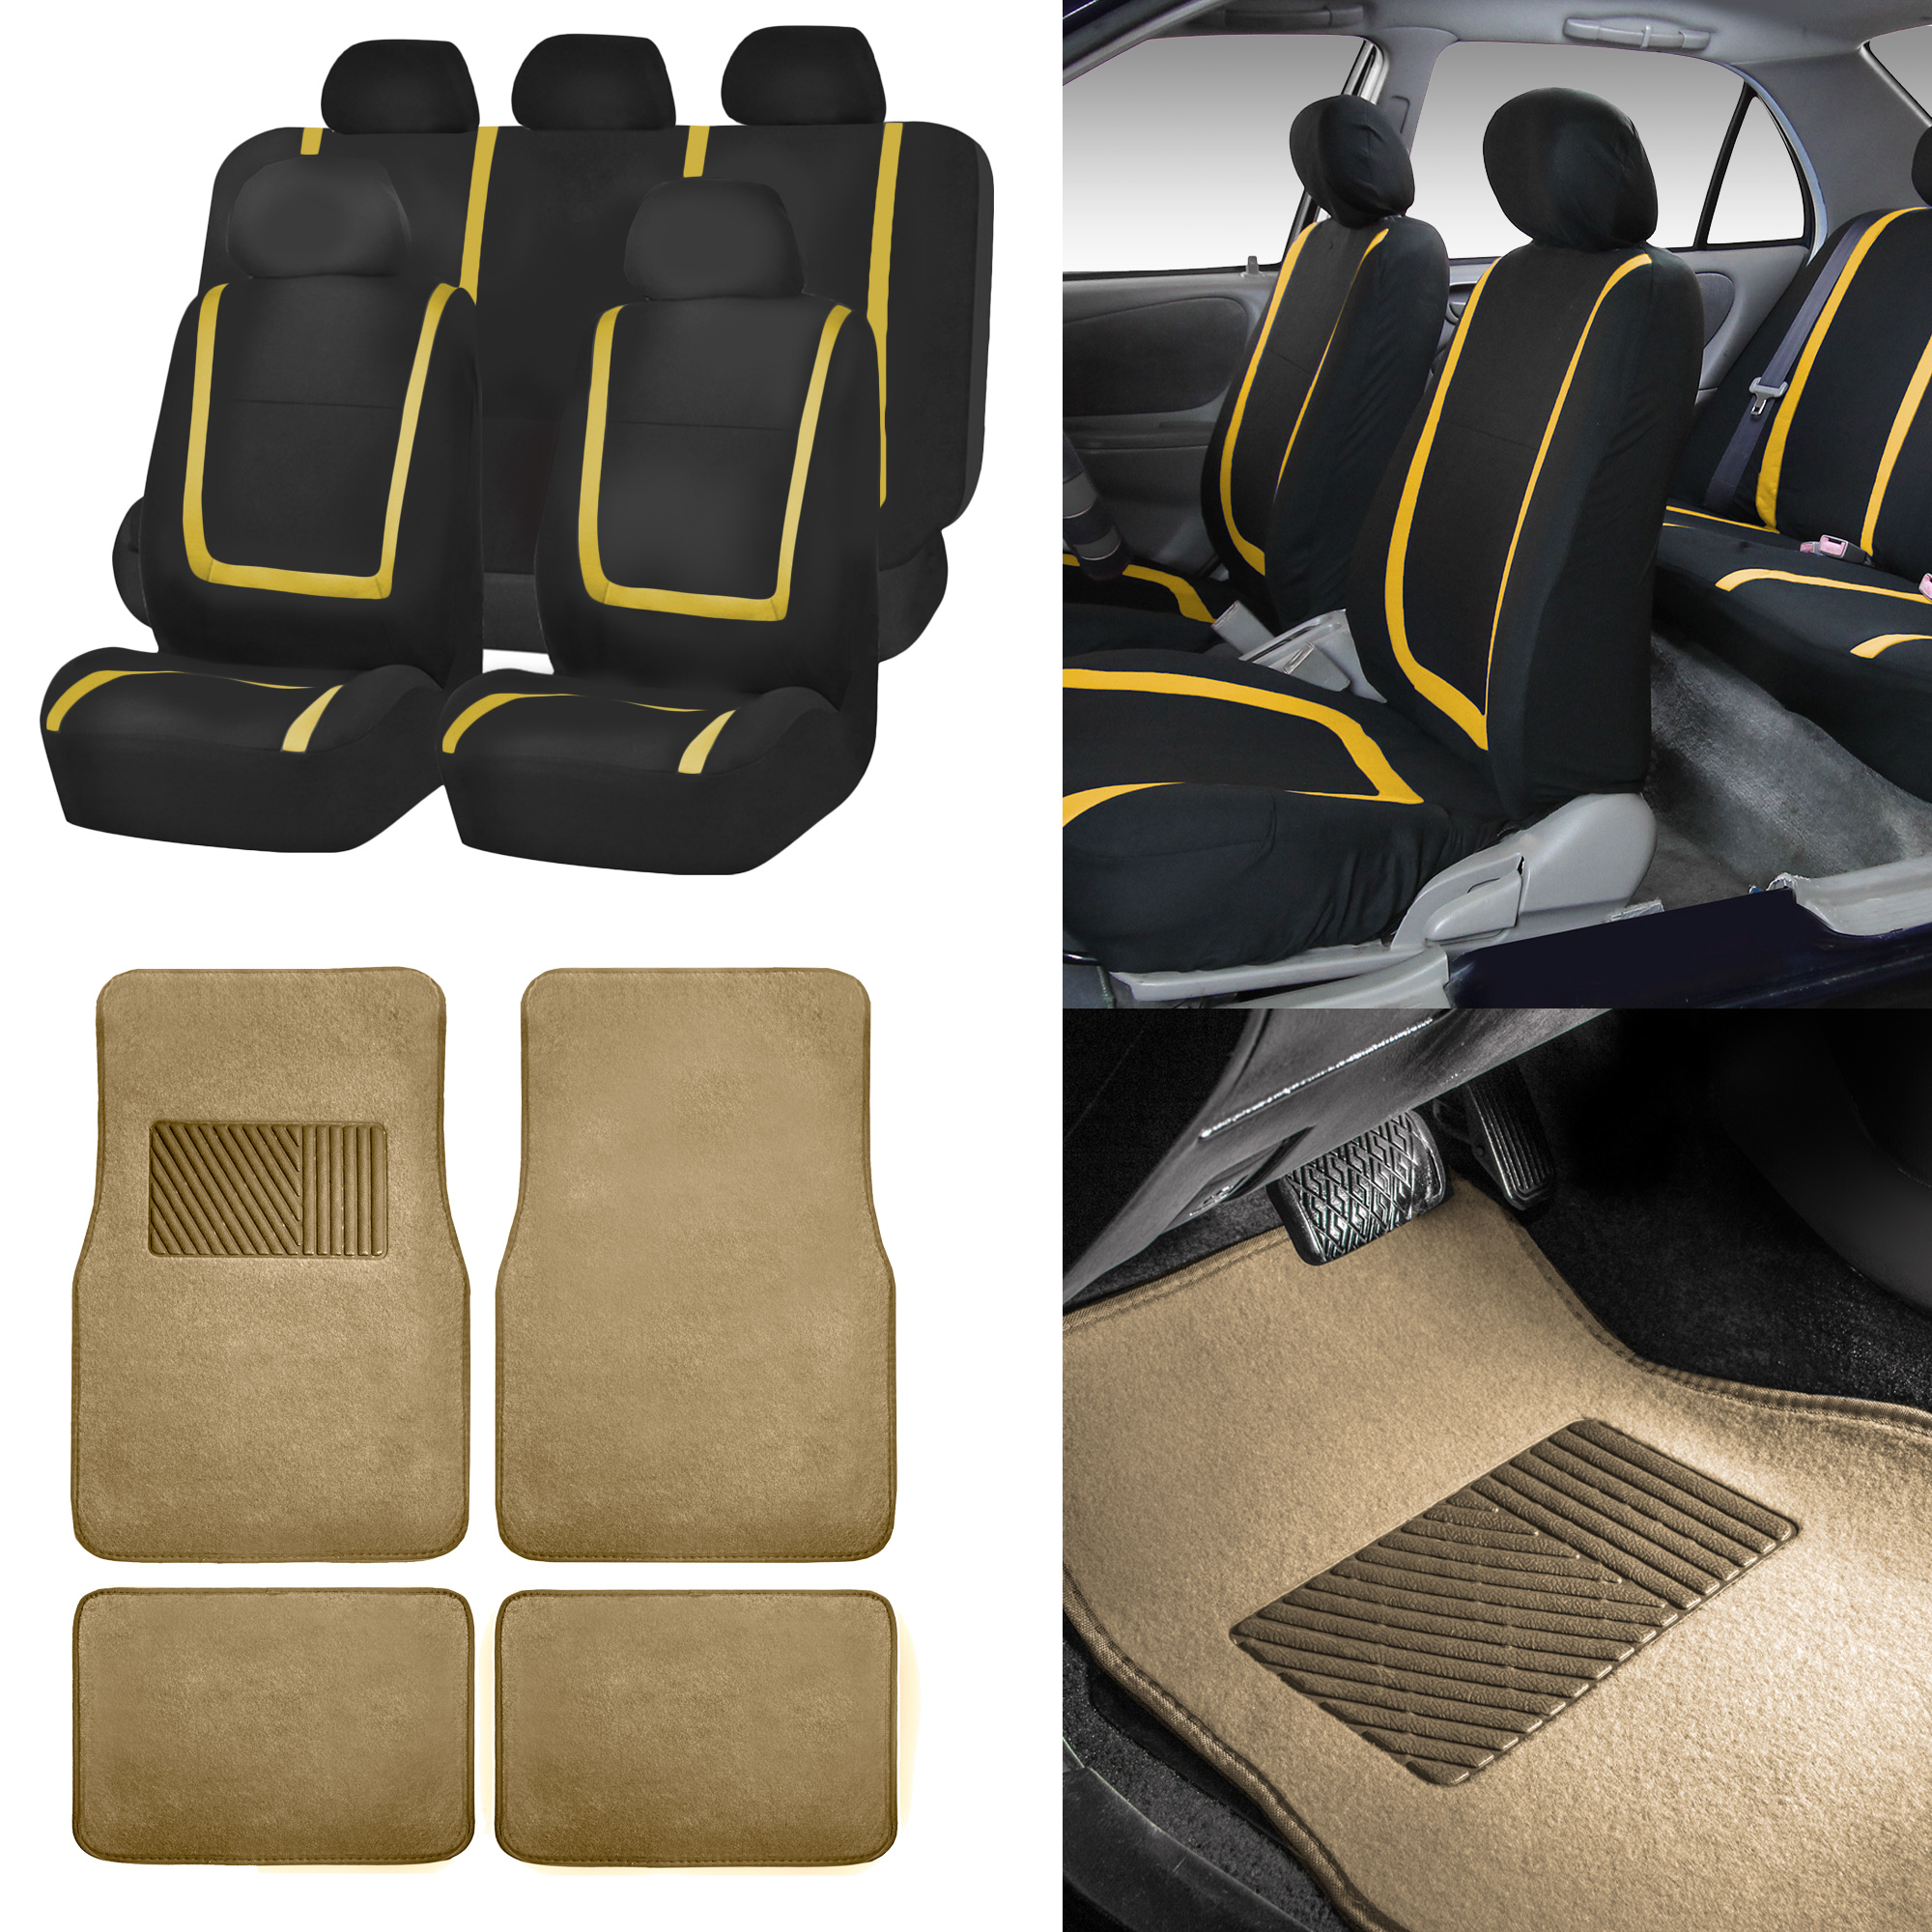 Marvelous Details About Black Yellow Car Seat Covers With Beige Carpet Floor Mats For Auto Car Suv Lamtechconsult Wood Chair Design Ideas Lamtechconsultcom